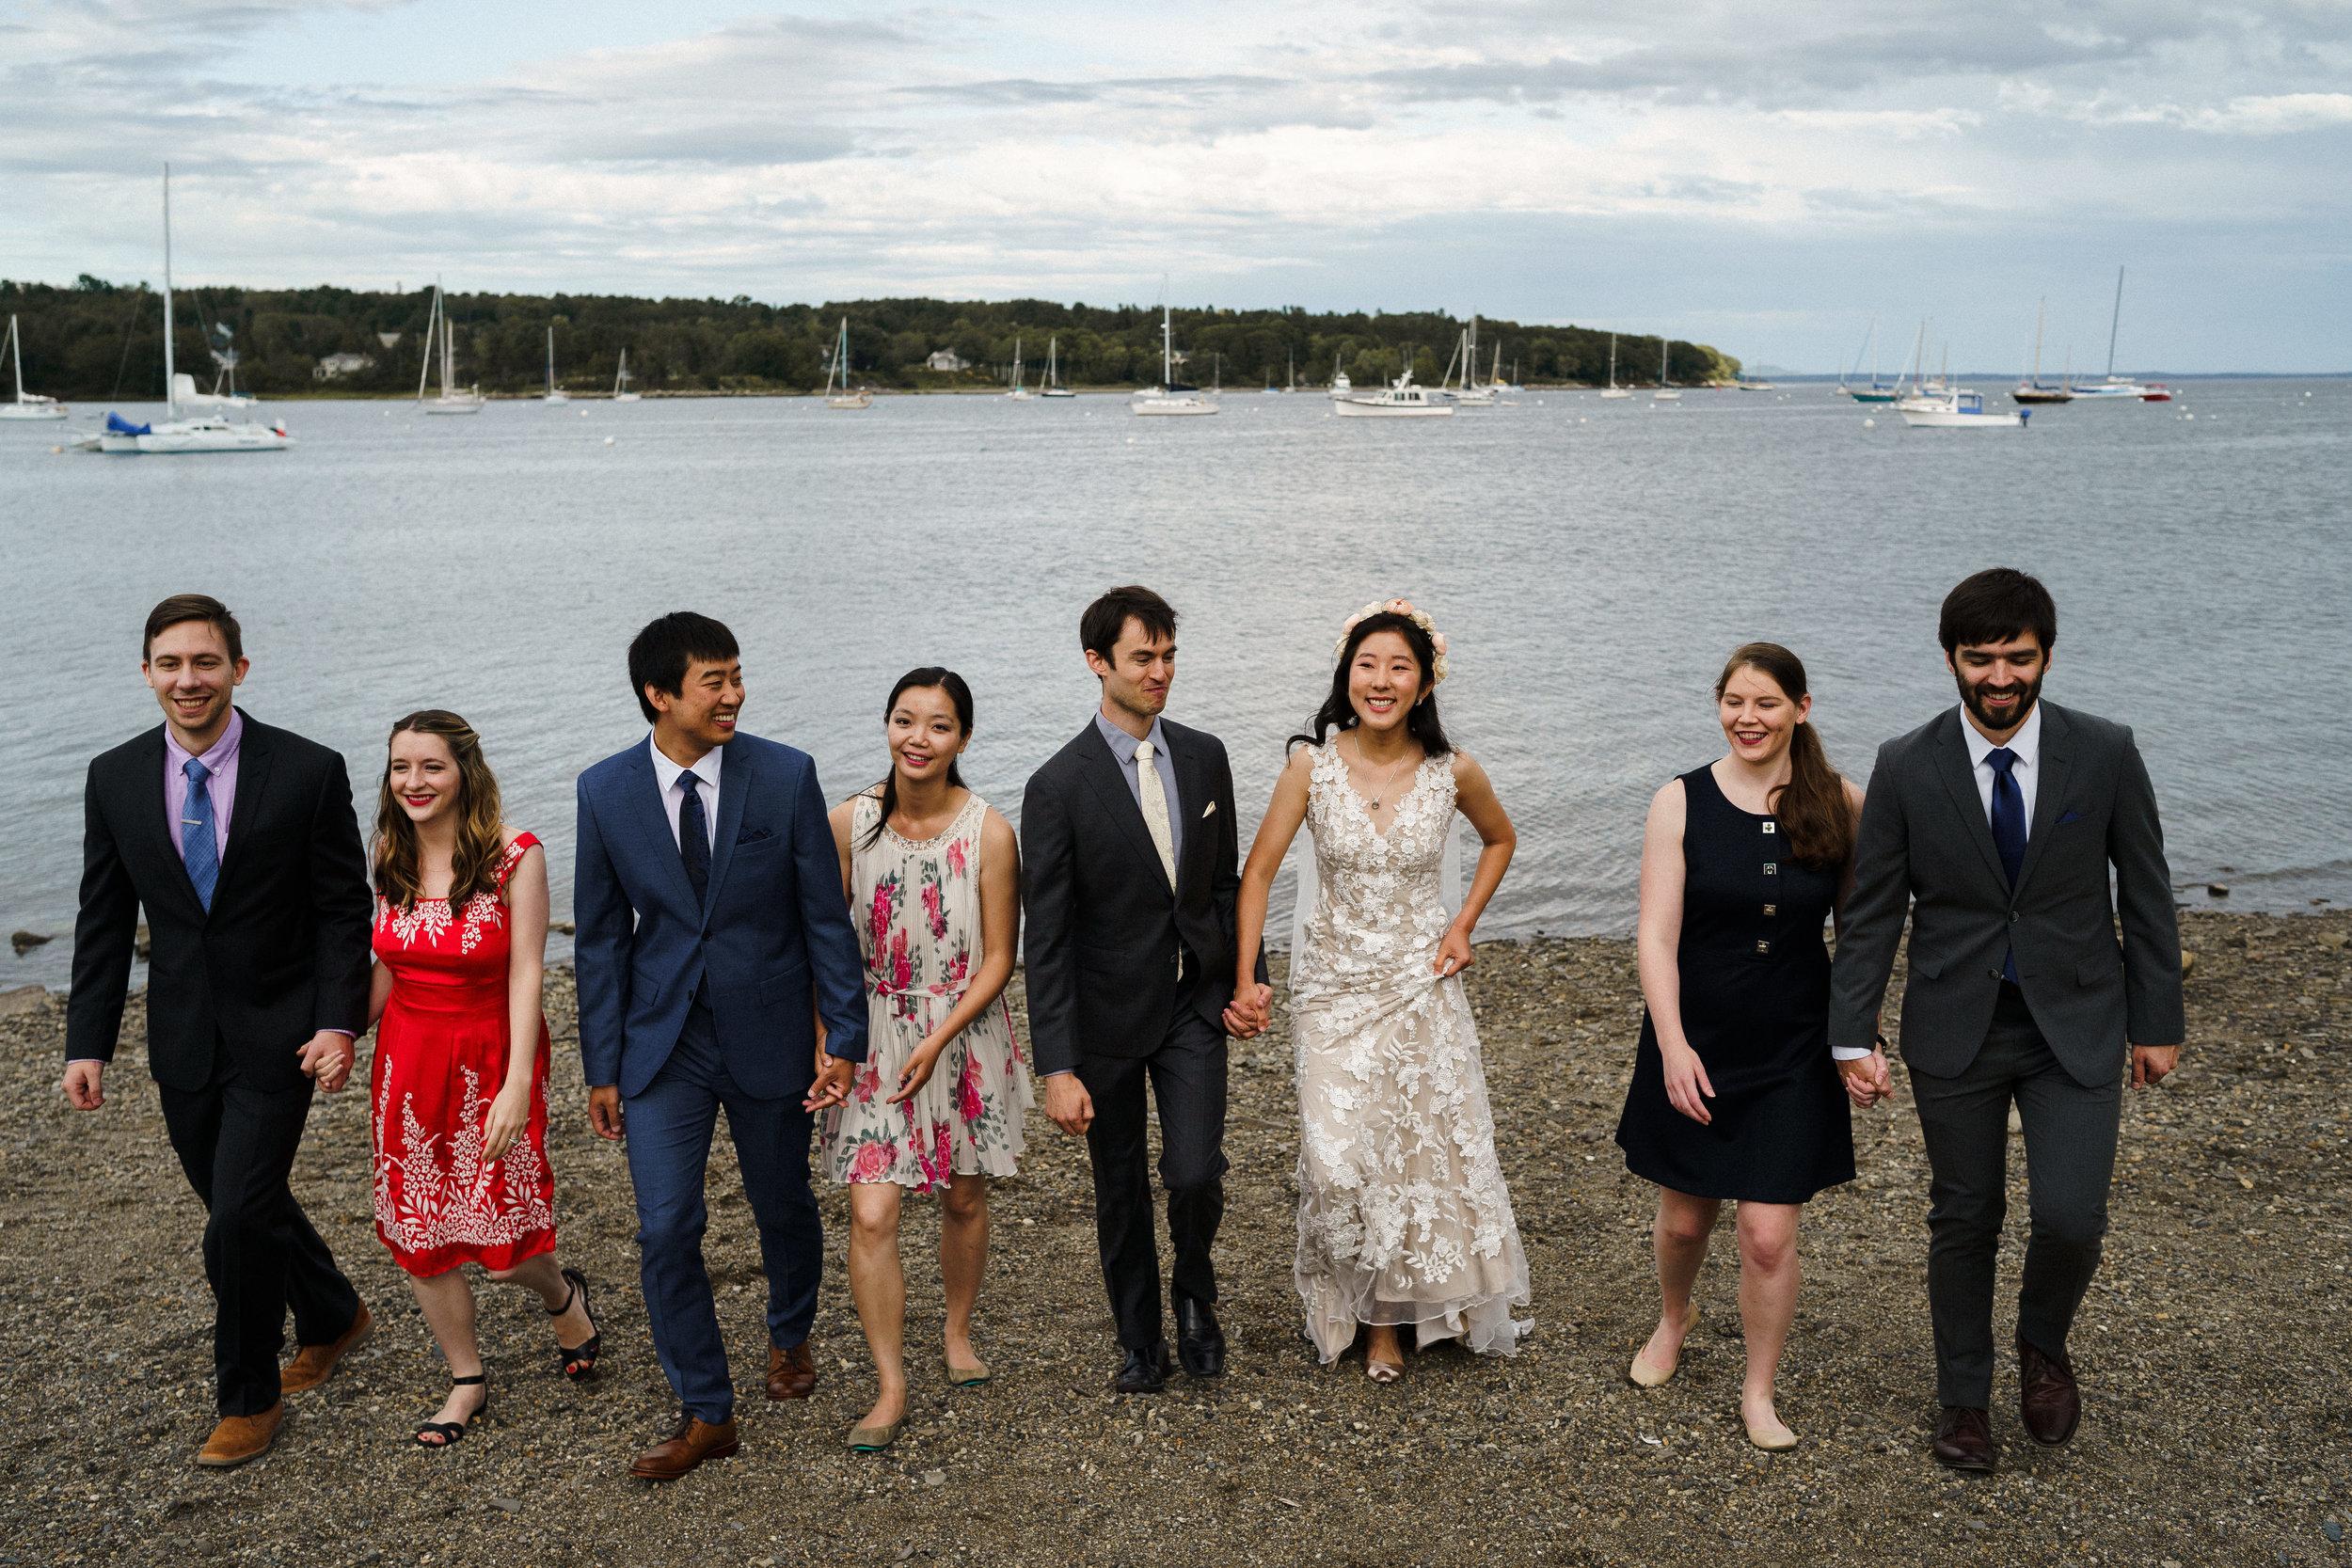 DSC00784.jpgBelfast Maine Coastal Destination Wedding Maine Wedding Photographer Oregon Wedding Photographer 11